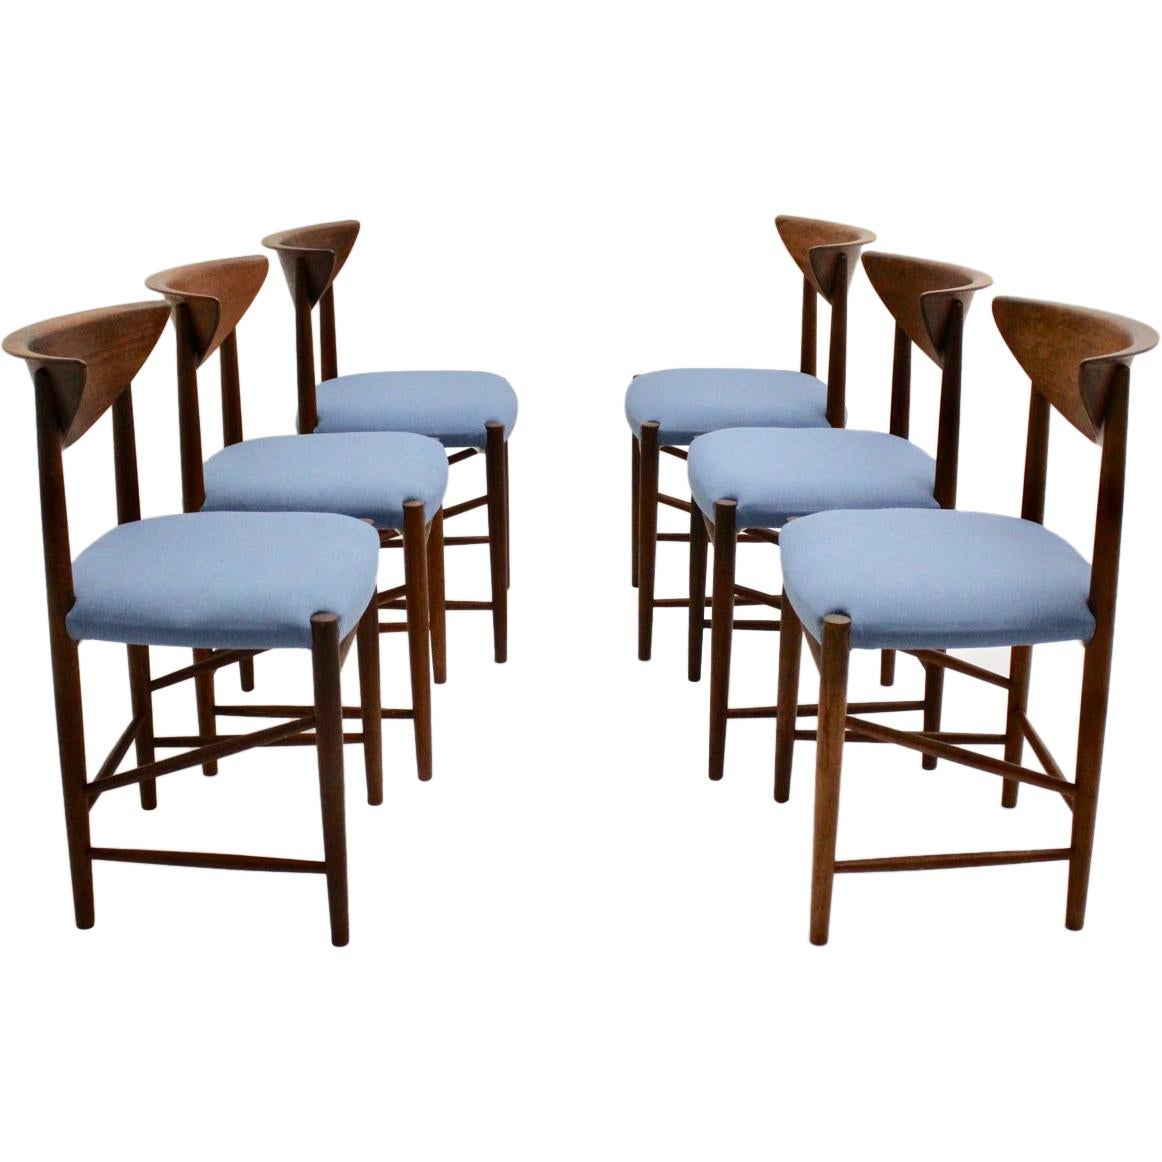 Scandinavian Modern Six Vintage Teak Dining Chairs or Chairs Peter Hvidt Denmark